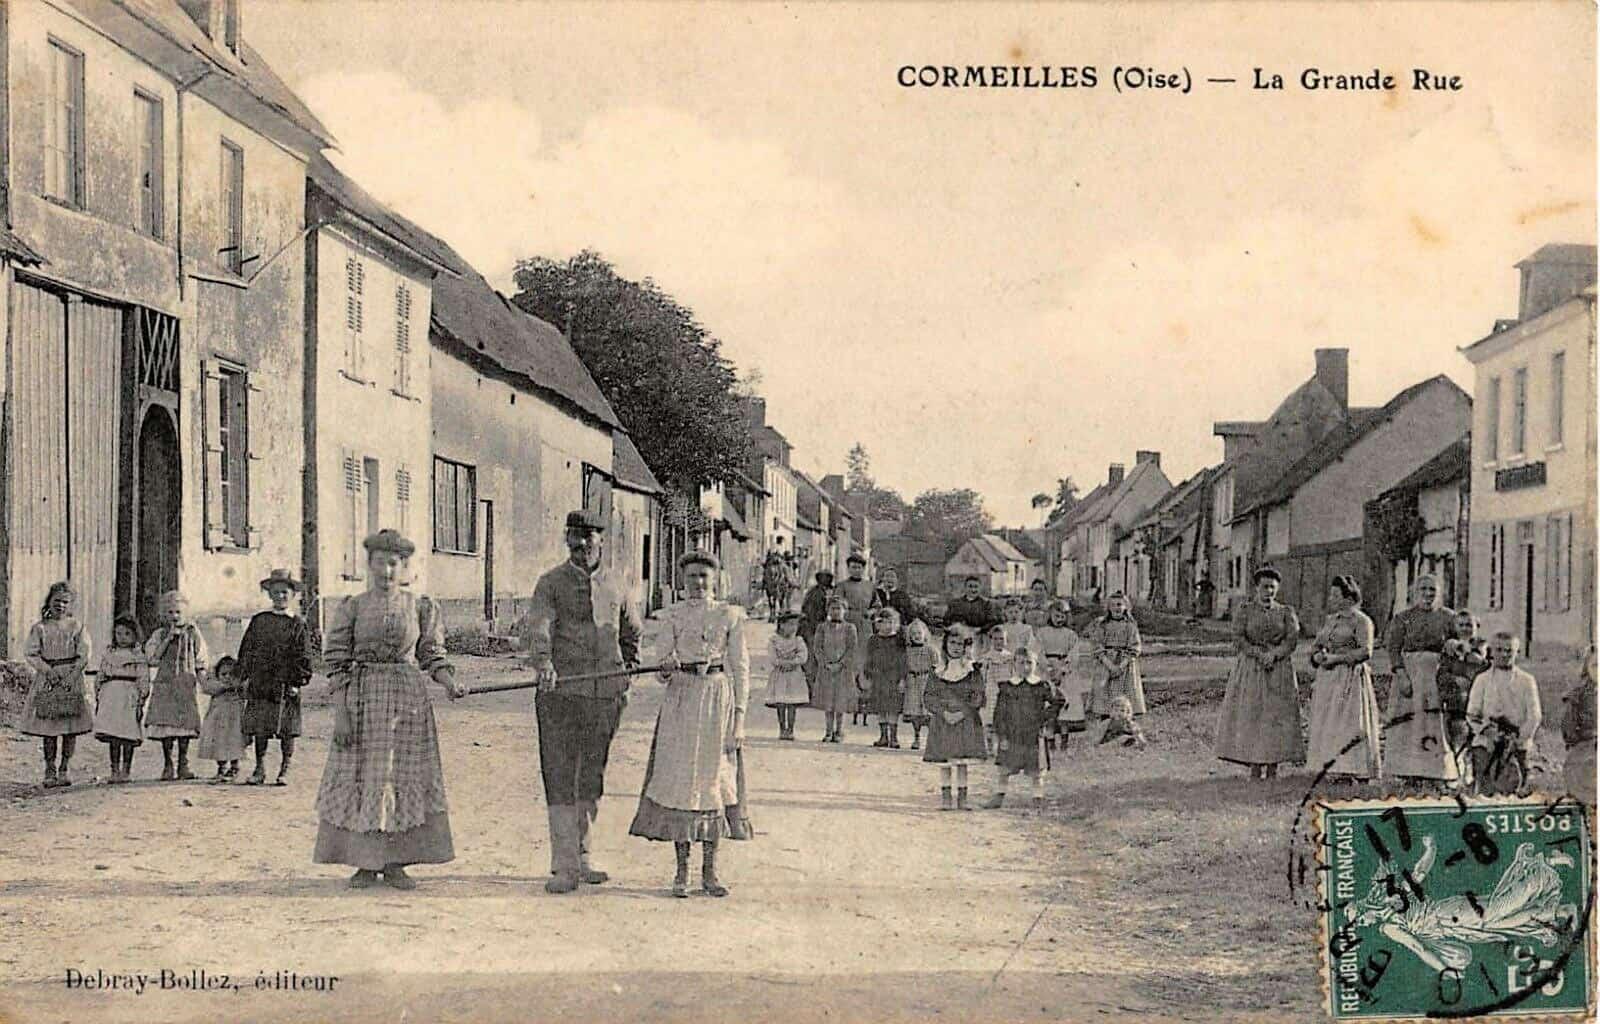 Corneilles